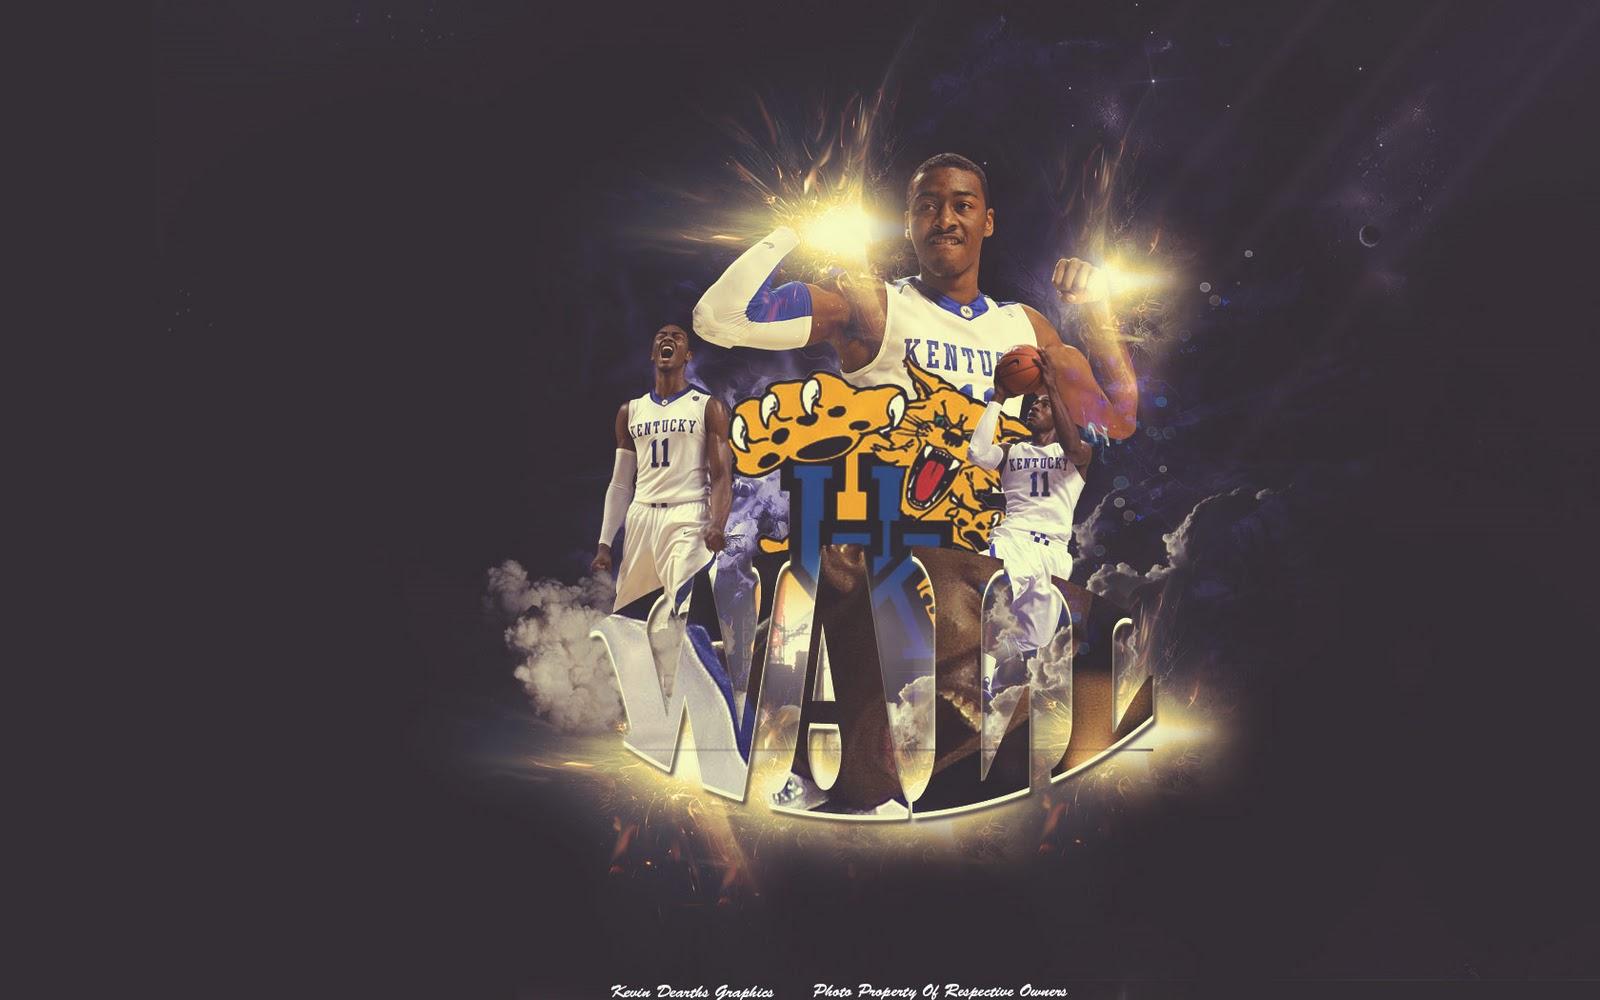 University Of Kentucky Chrome Themes Ios Wallpapers: Kentucky Basketball Wallpapers (47 Wallpapers)